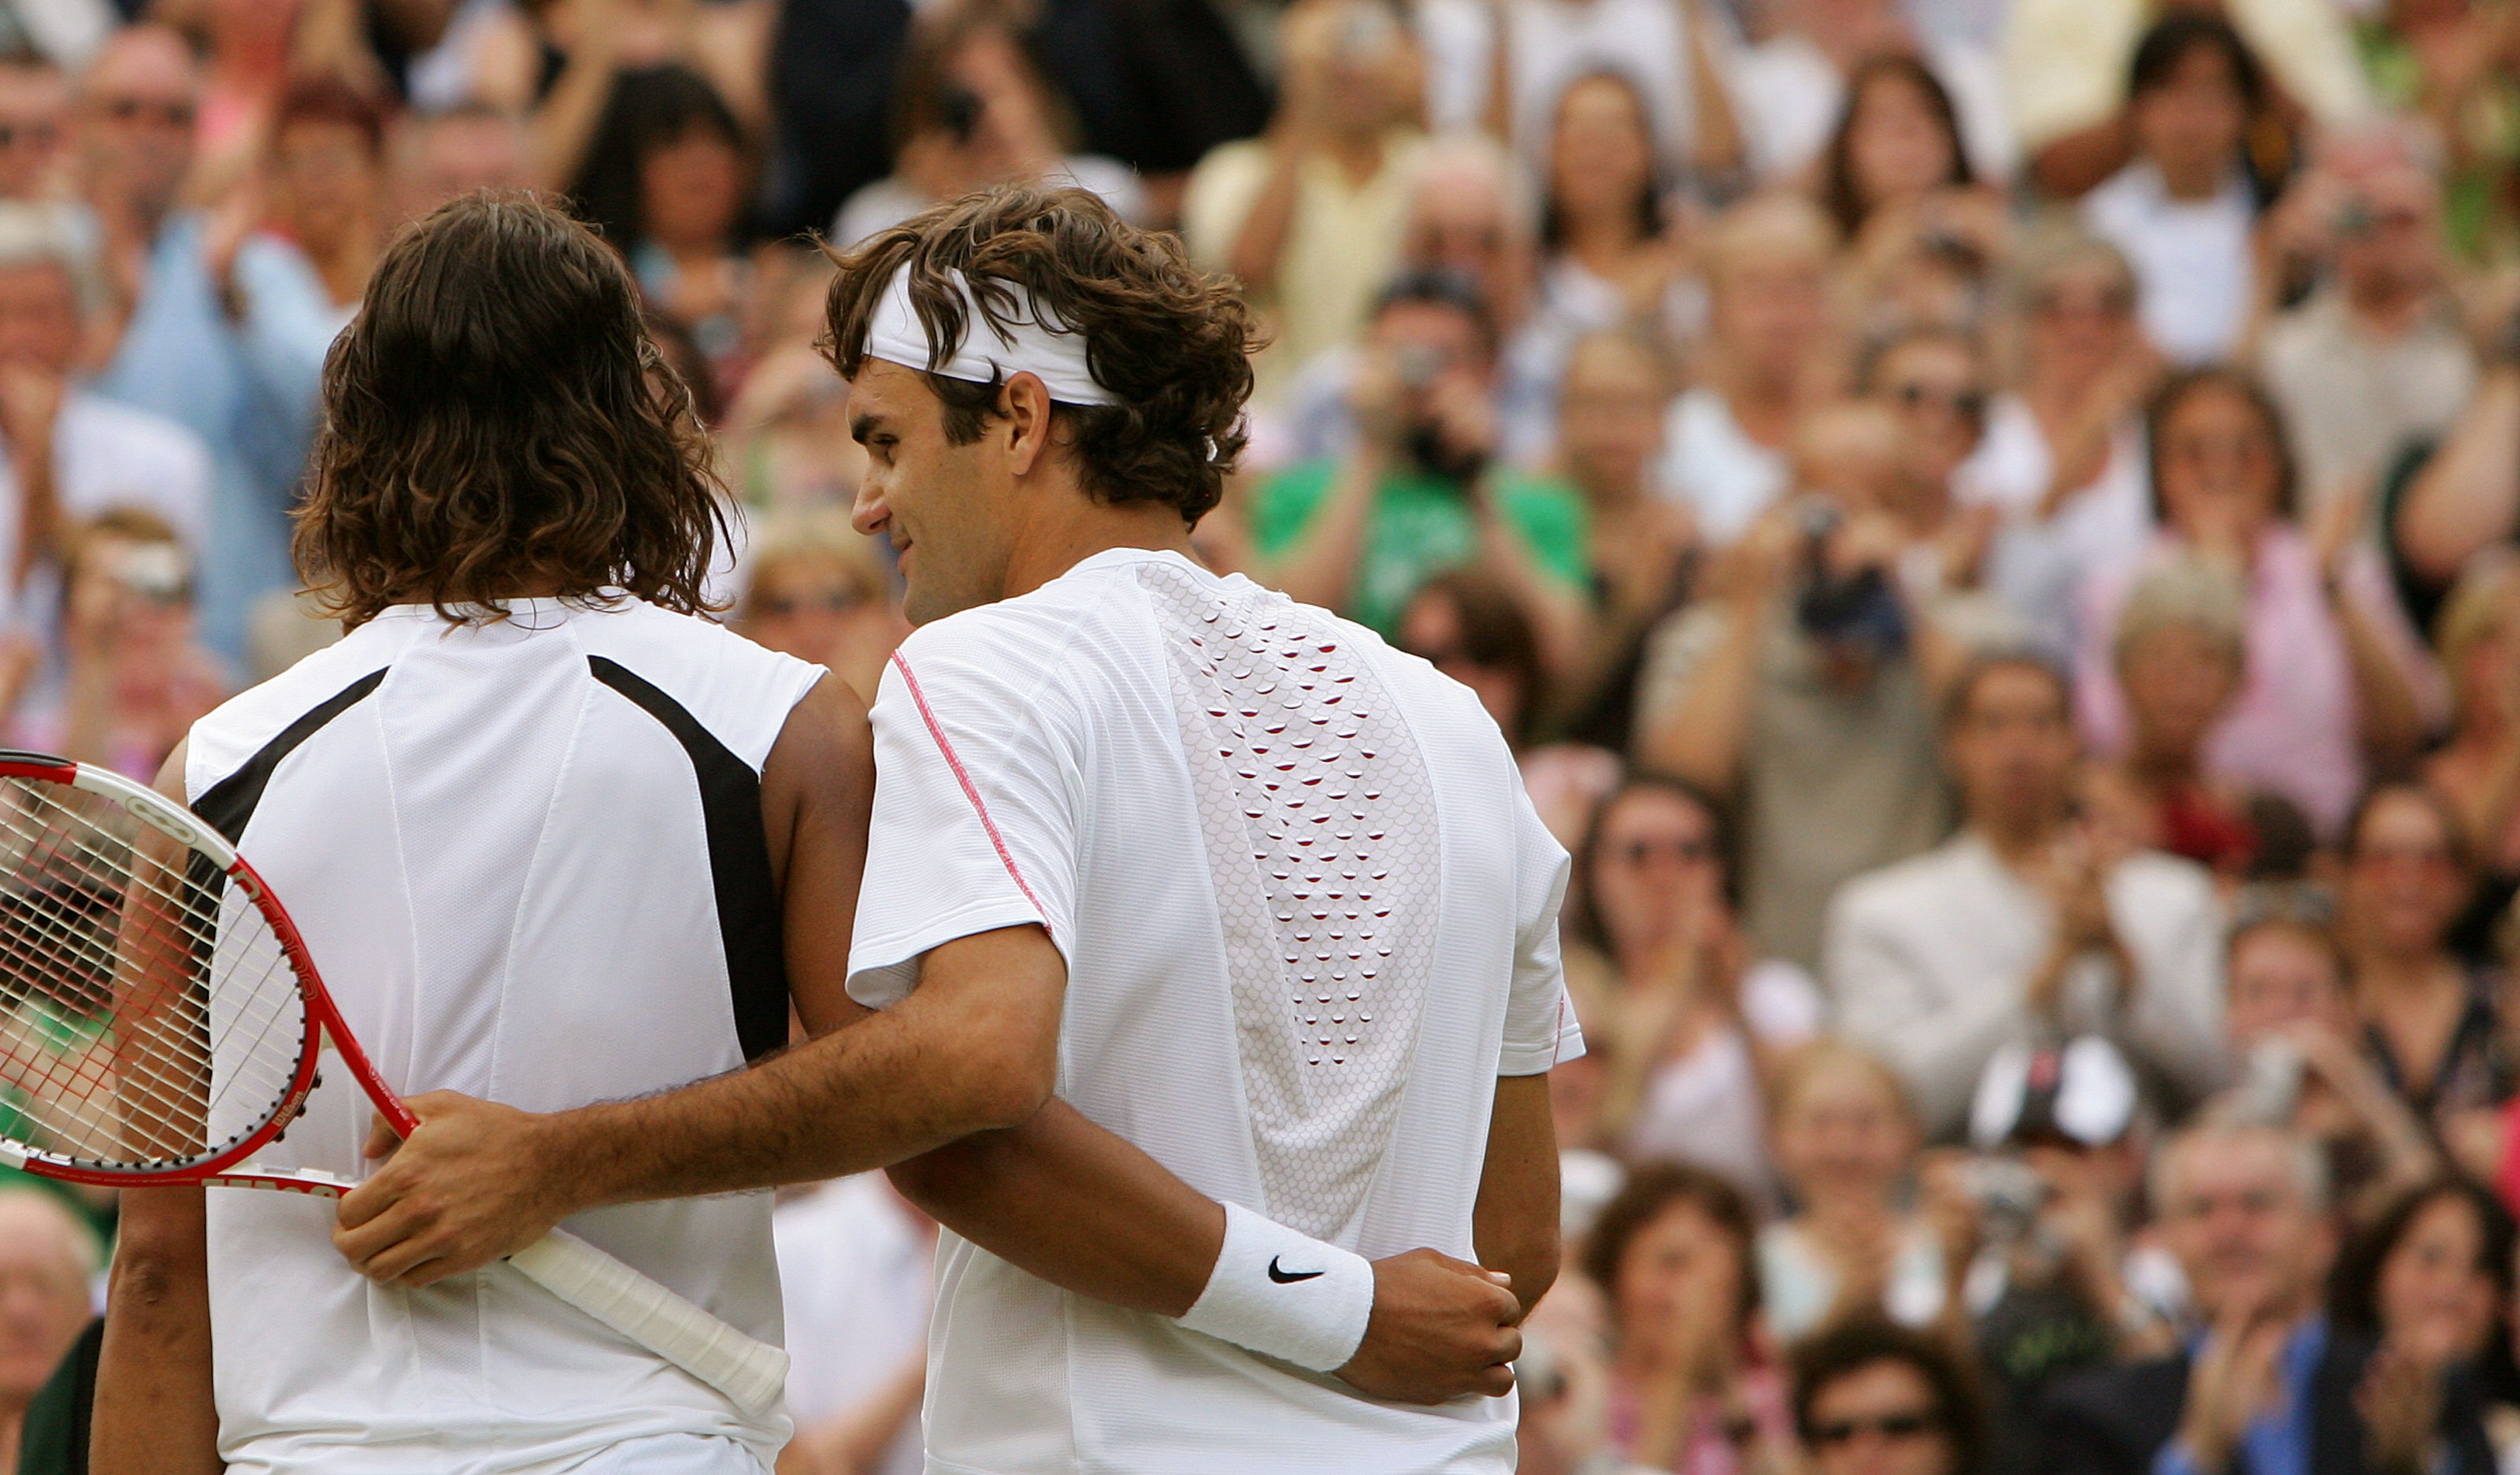 Rafael Nadal - Roger Federer (2006 Wimbledon)